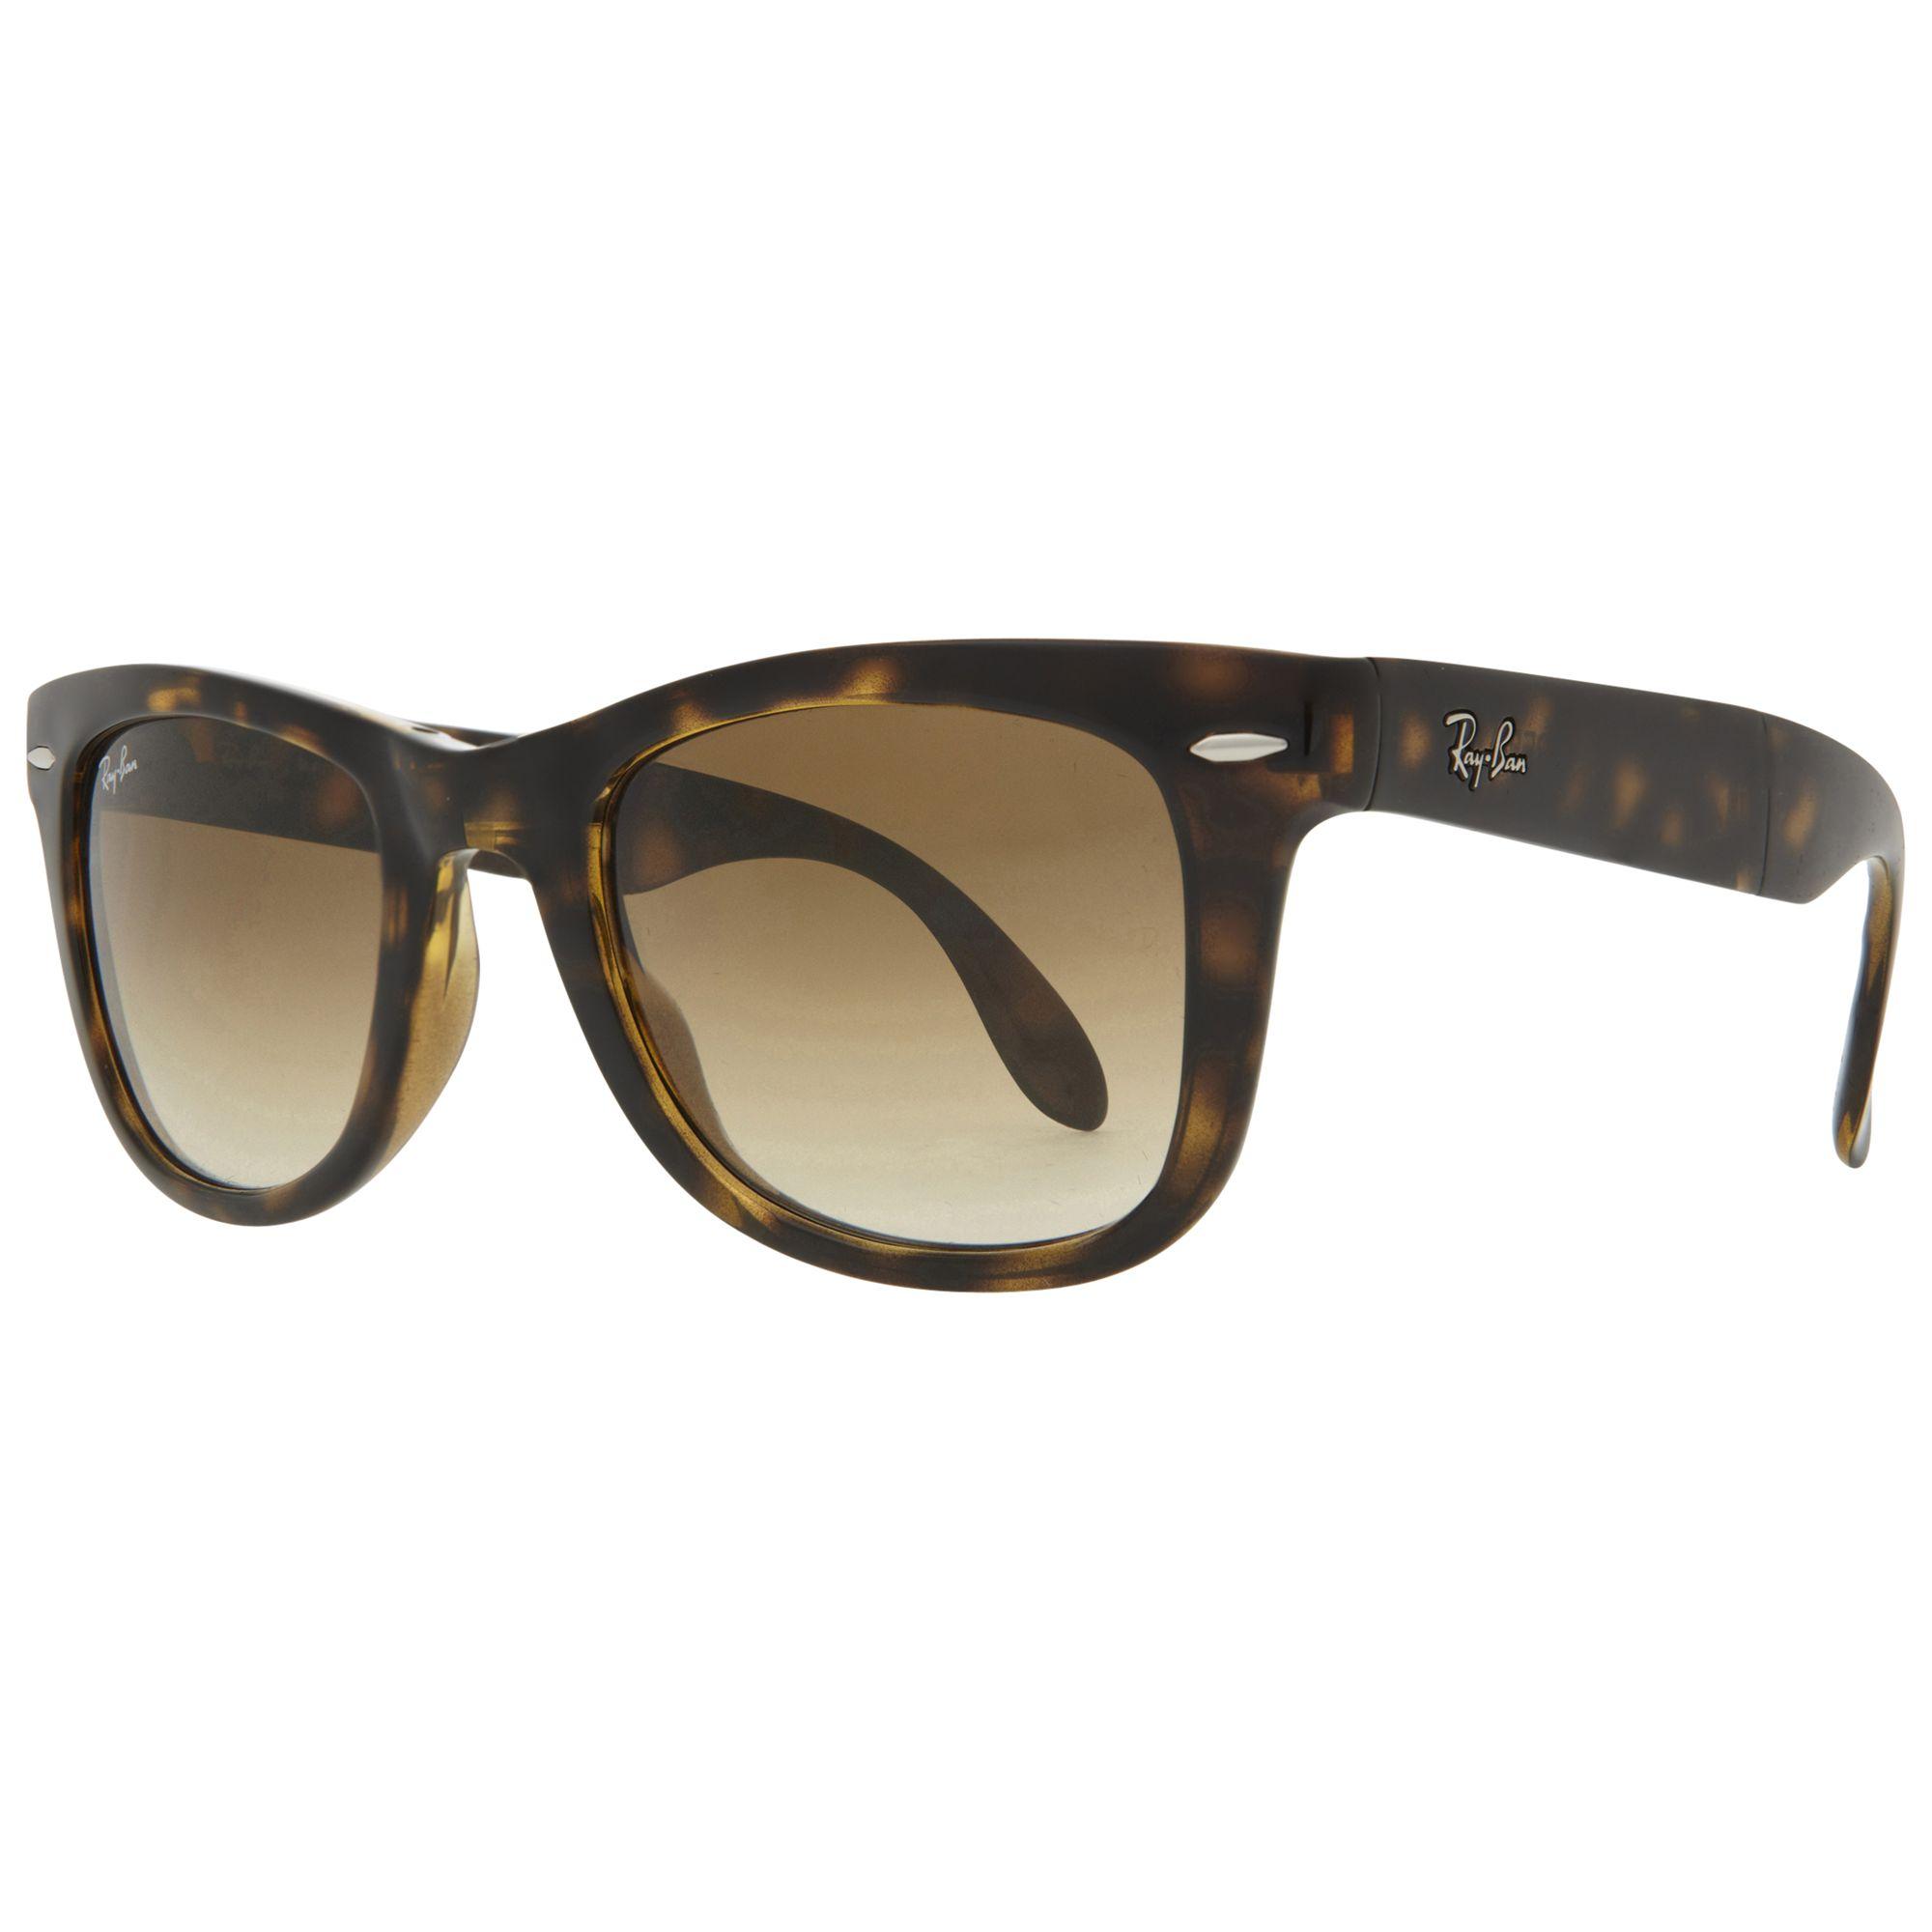 Ray-ban Ray-Ban RB4105 Folding Wayfarer Sunglasses, Light Havana